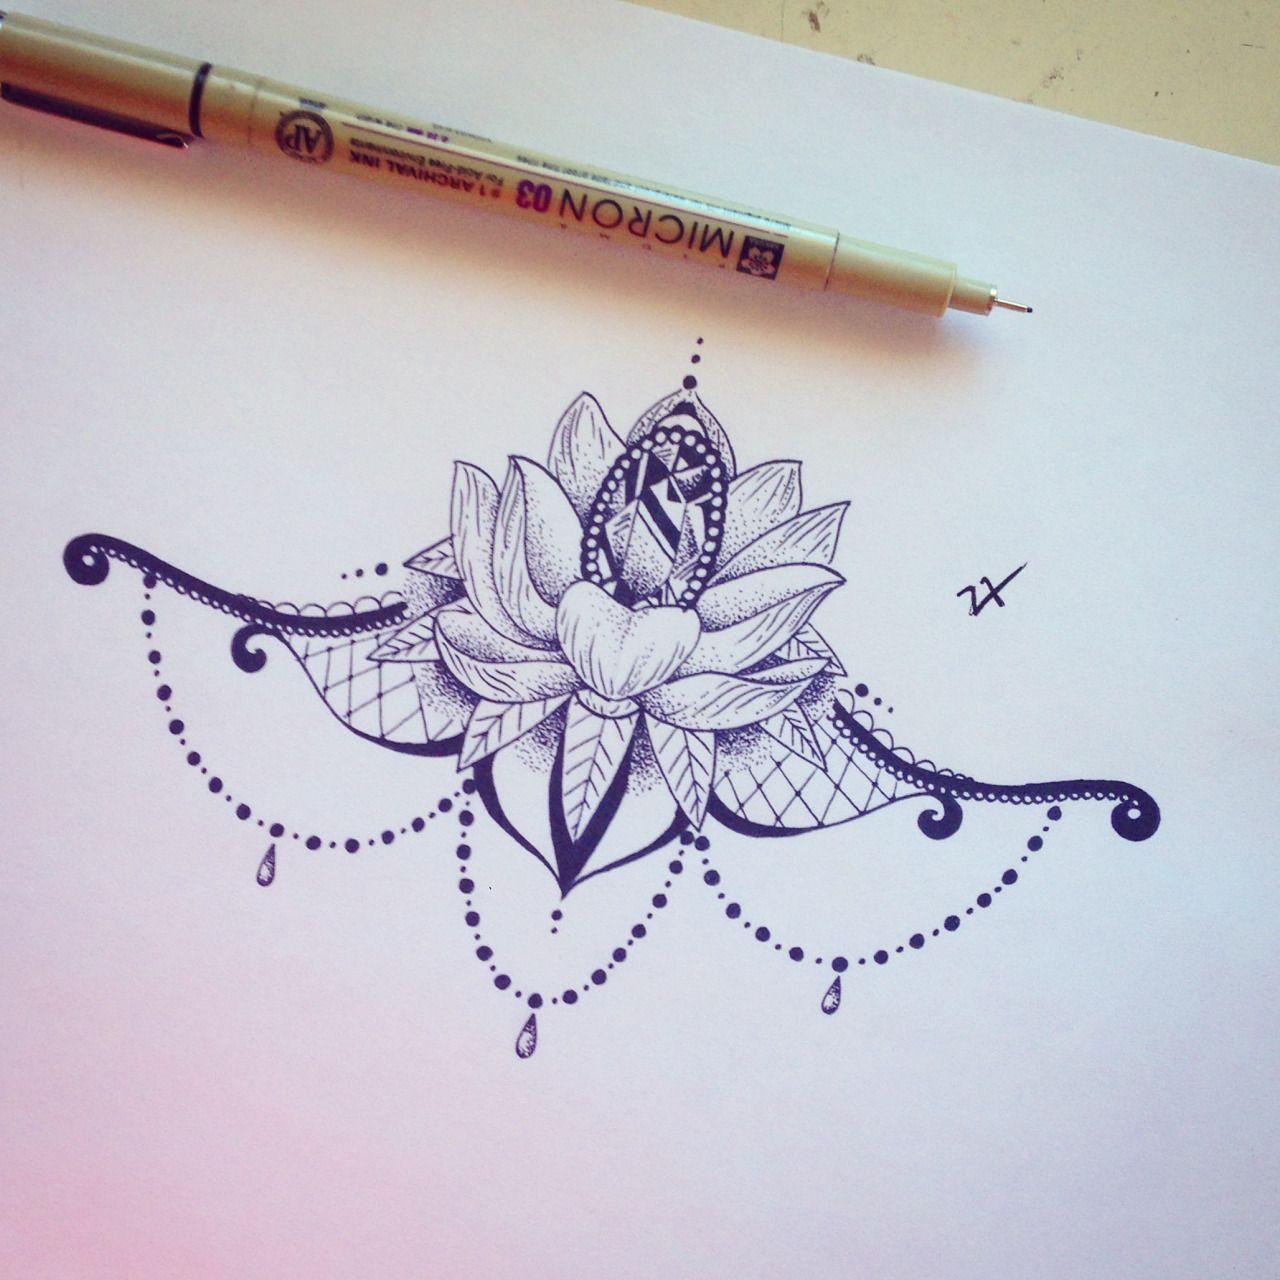 underboob tat google search permanent art pinterest tattoo ideen tattoo vorlagen und. Black Bedroom Furniture Sets. Home Design Ideas